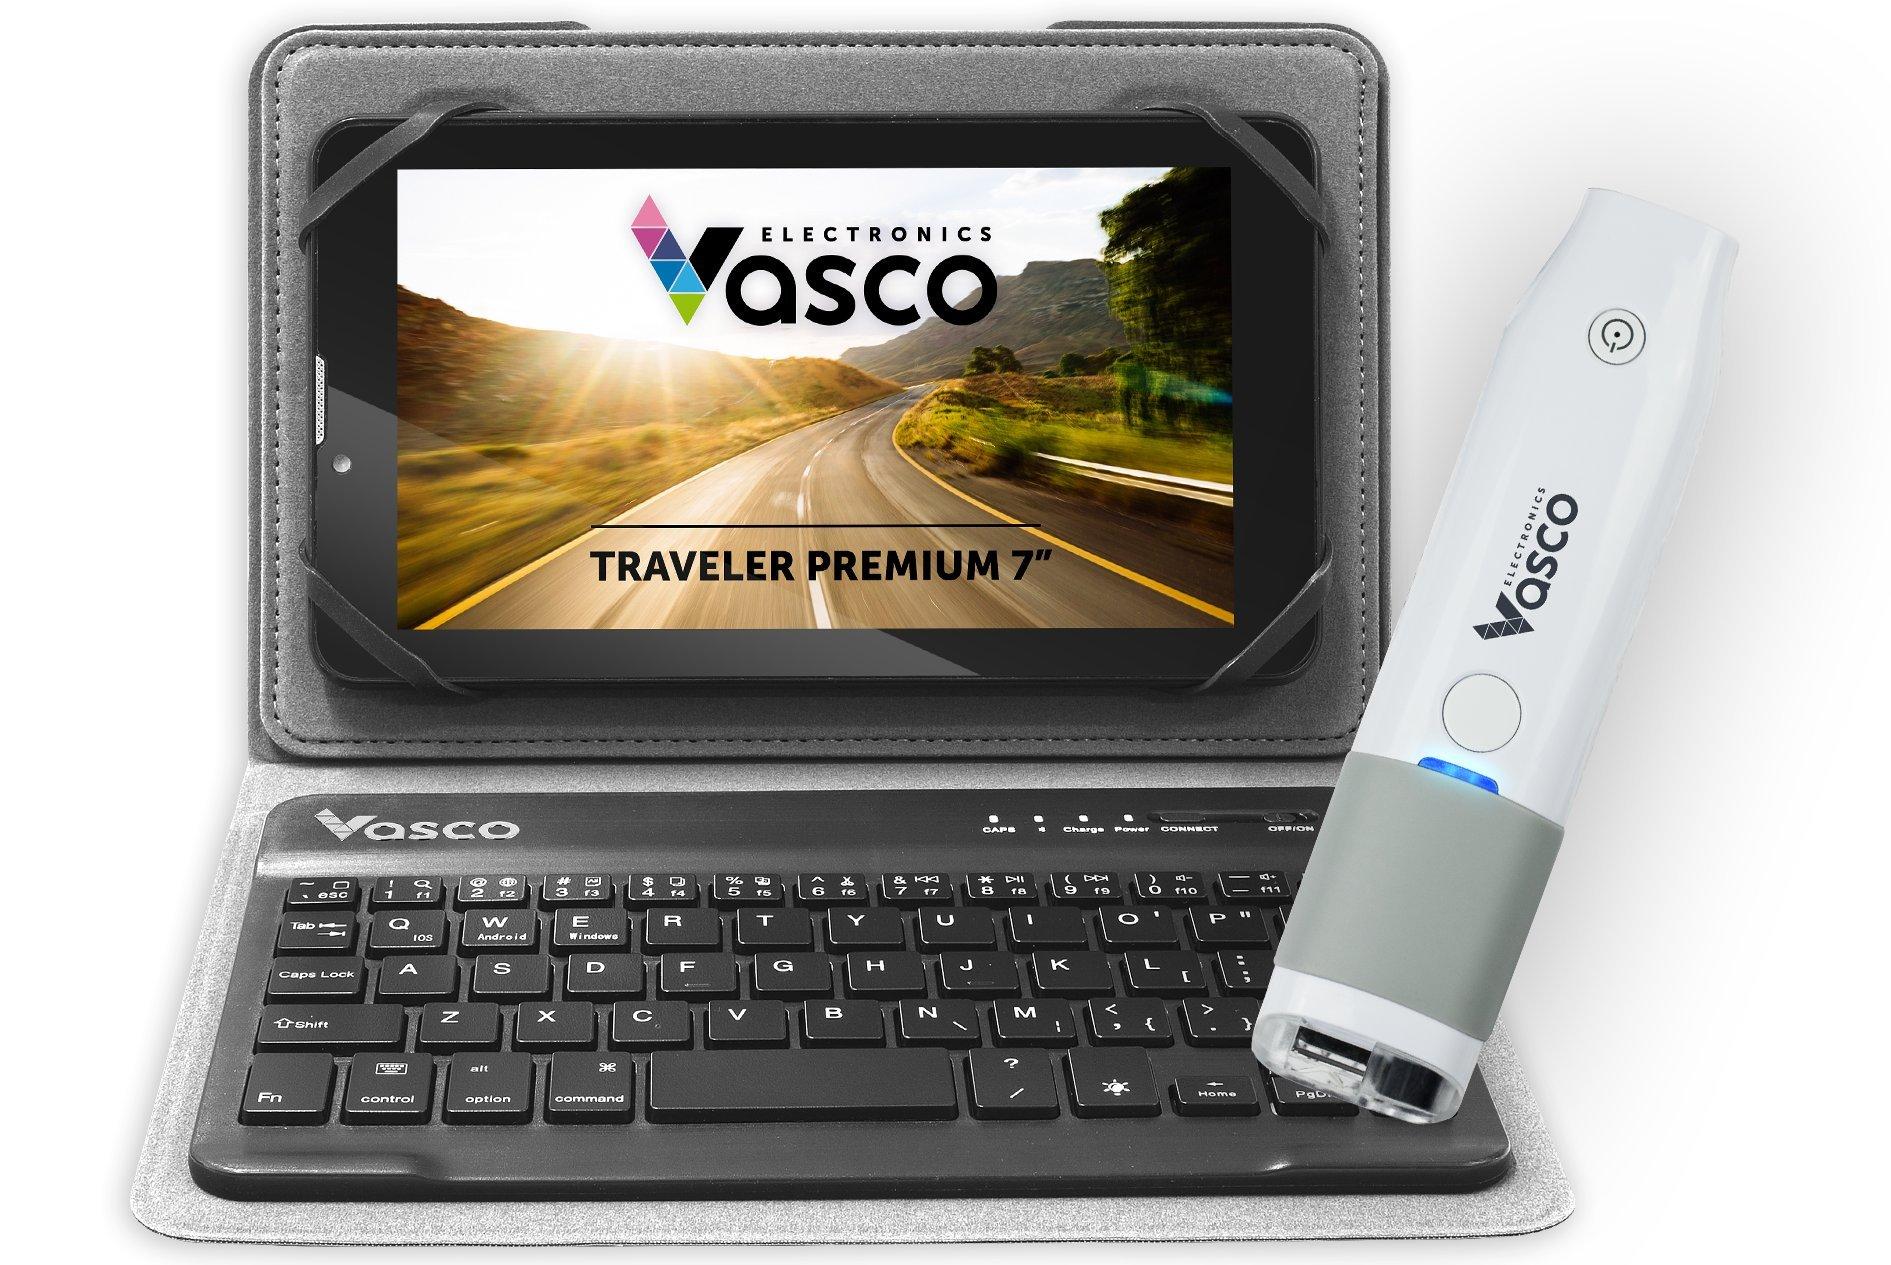 Vasco Traveler Premium 7'' + Scanner + Keyboard: Speech Translator, GPS Navigation, Free Phone